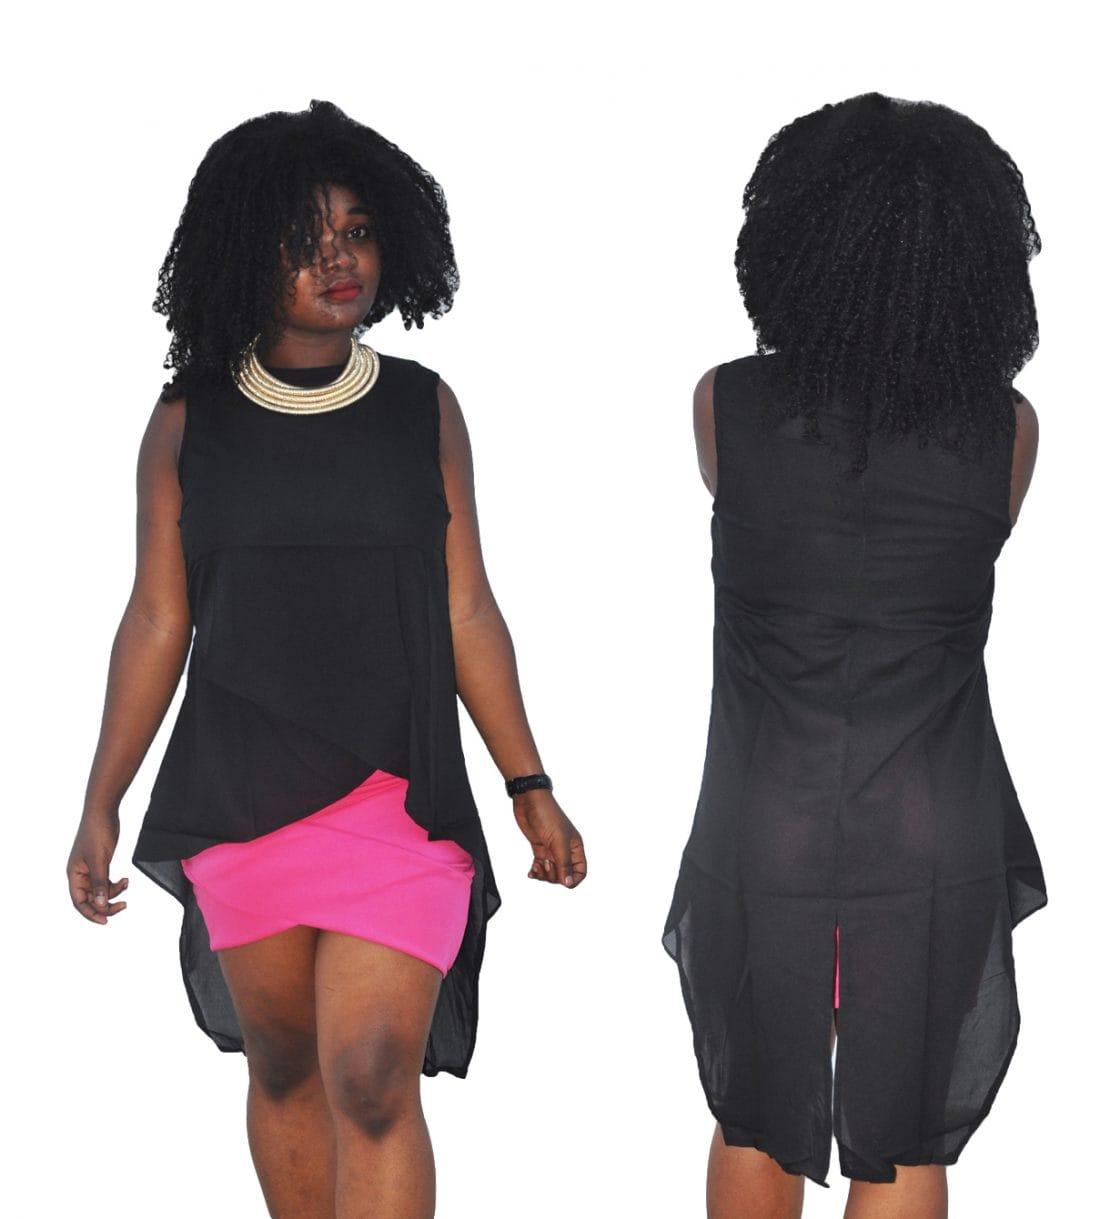 M0264 black1 Blouses Tops Shirts maureens.com boutique